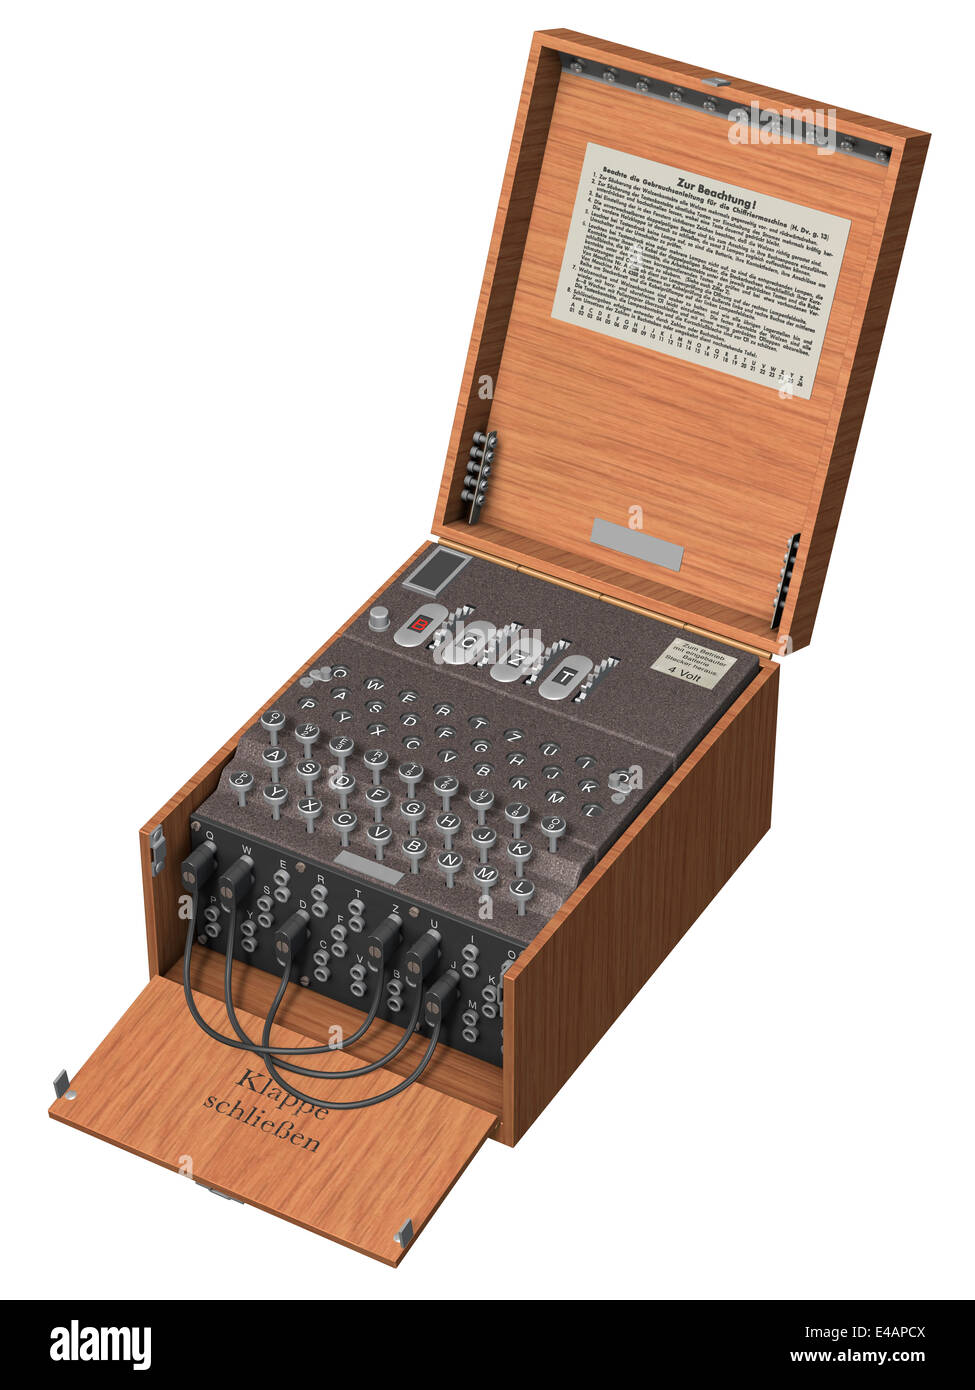 Enigma Machine - Stock Image